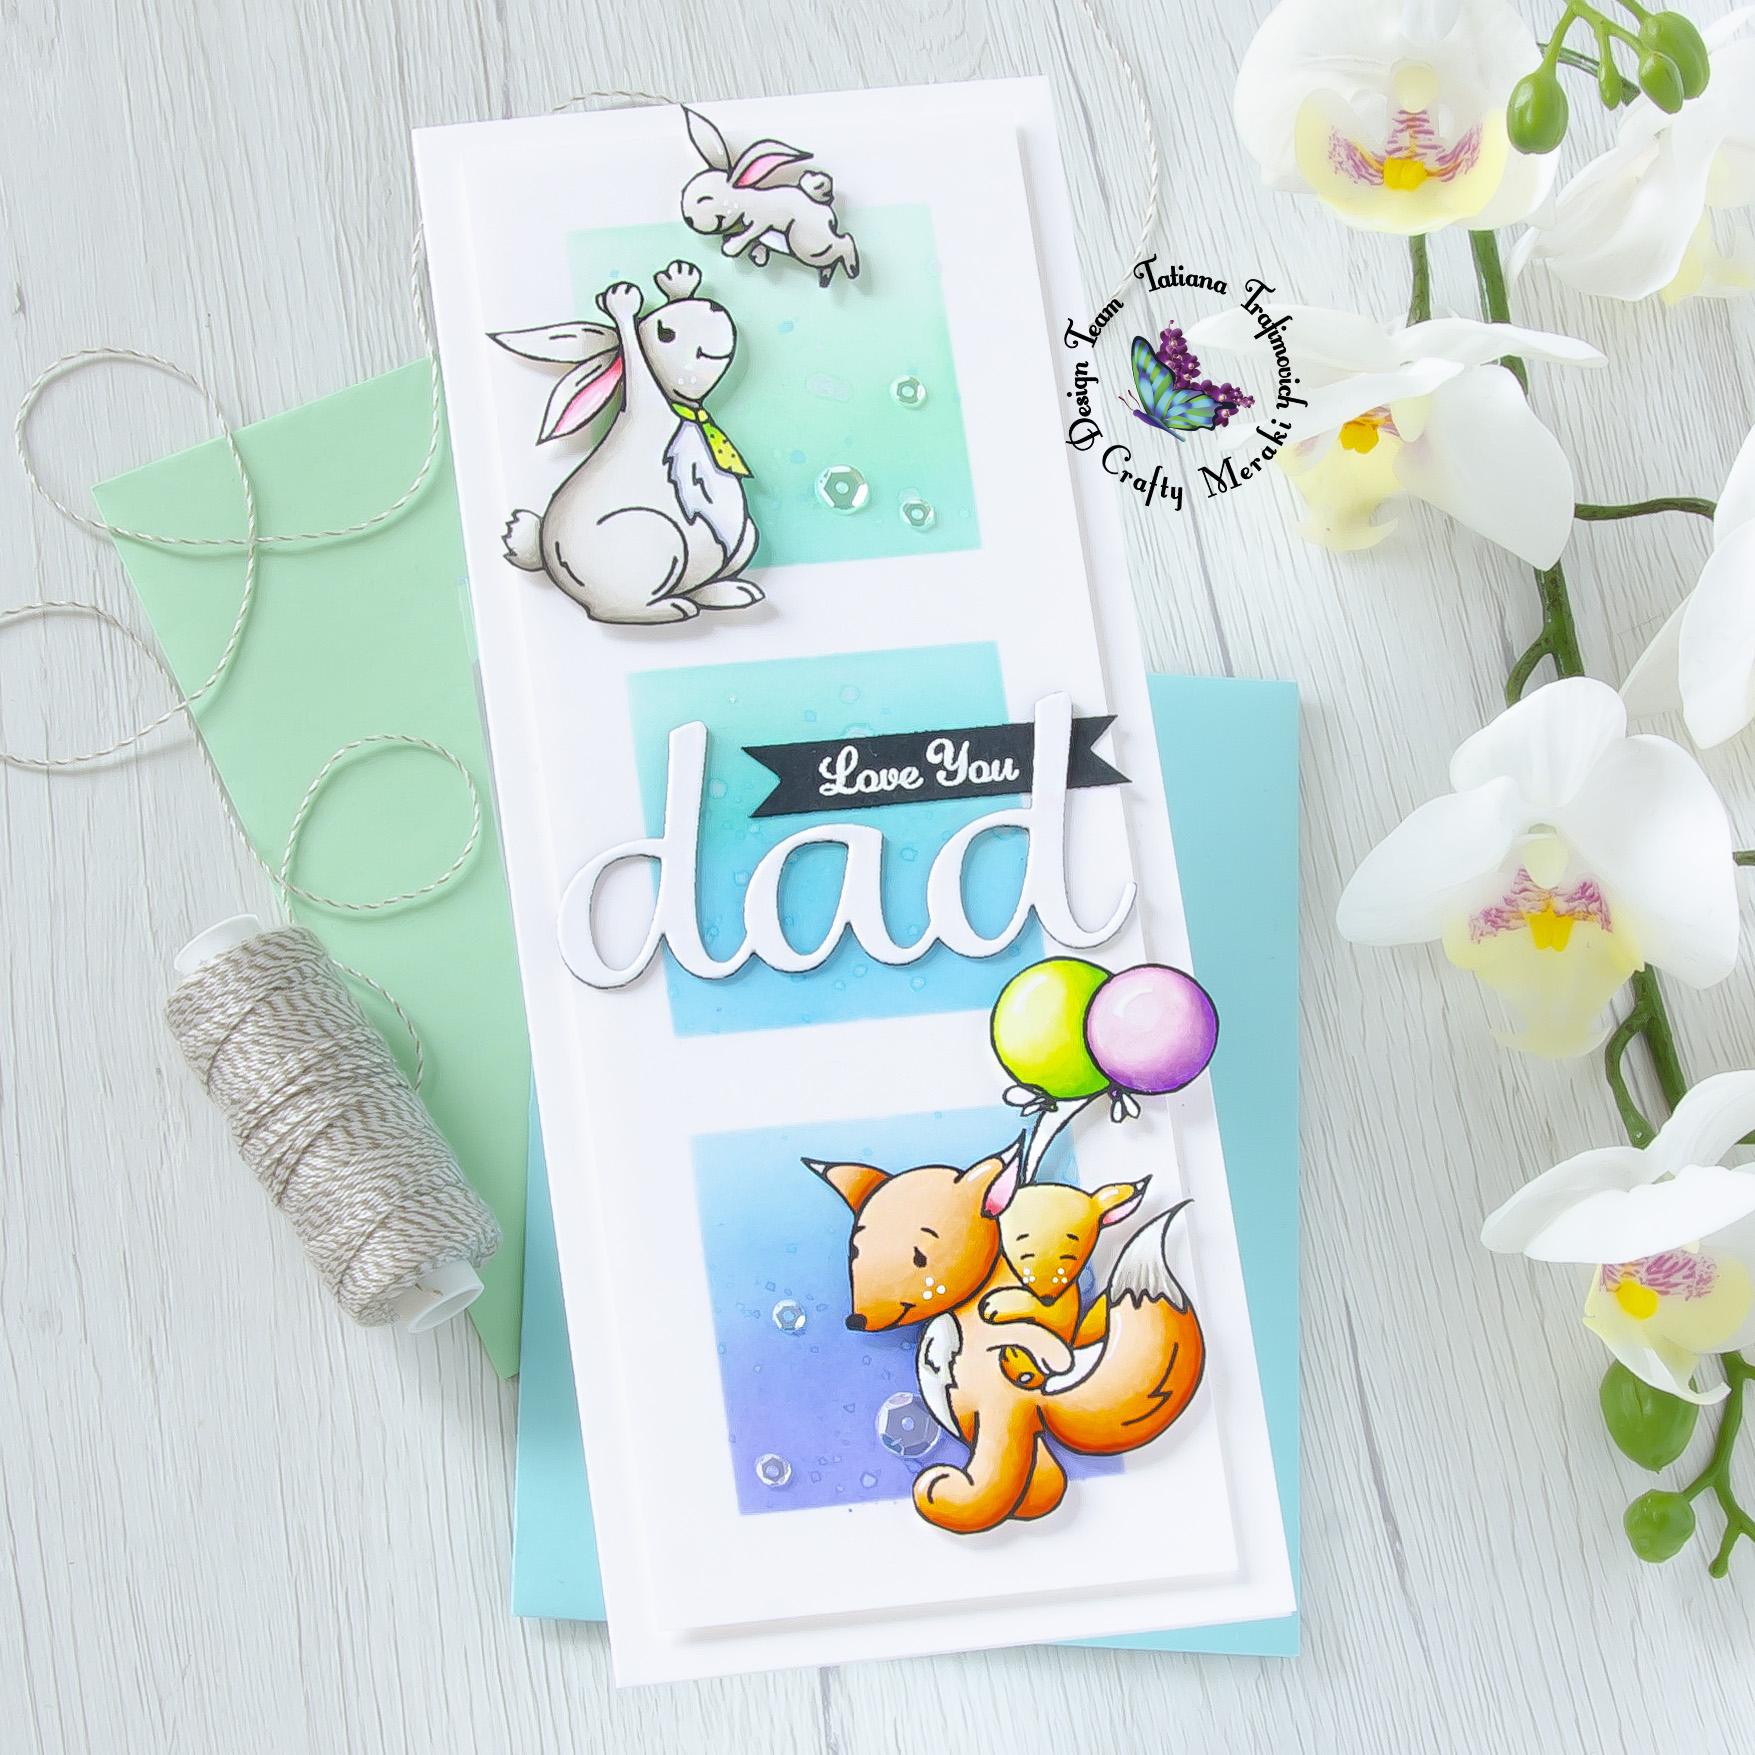 Love You Dad #handmade card by Tatiana Trafimovich #tatianacraftandart - The Legend stamp set by Crafty Meraki #craftymeraki